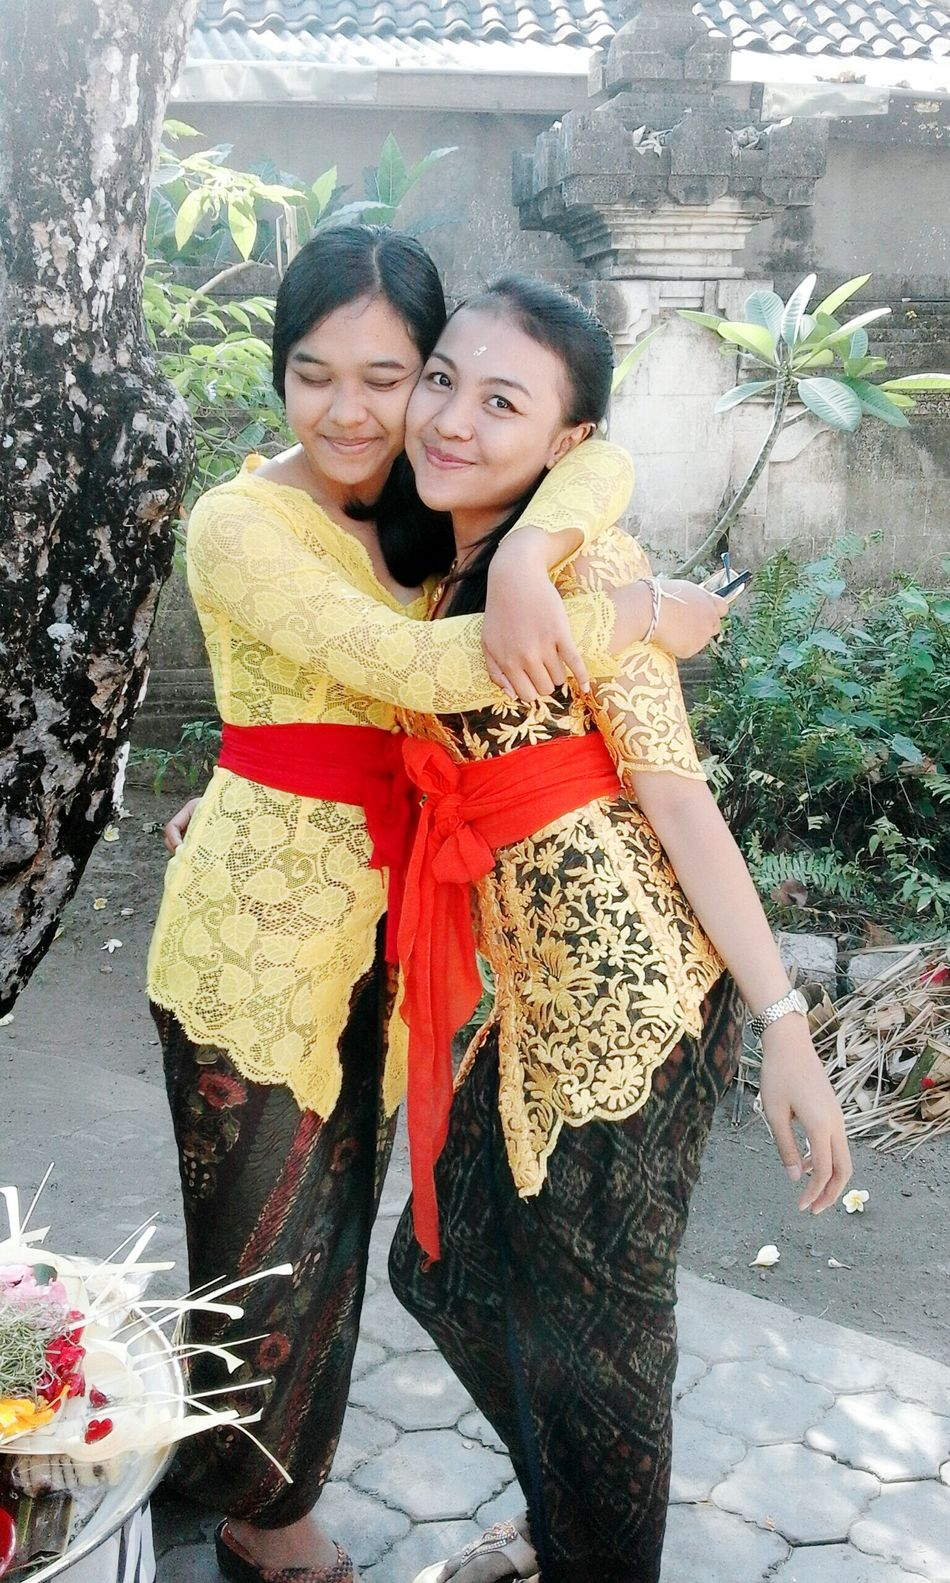 happy yellow day First Eyeem Photo Balinesegirls Happy Time ForTheFirstTime